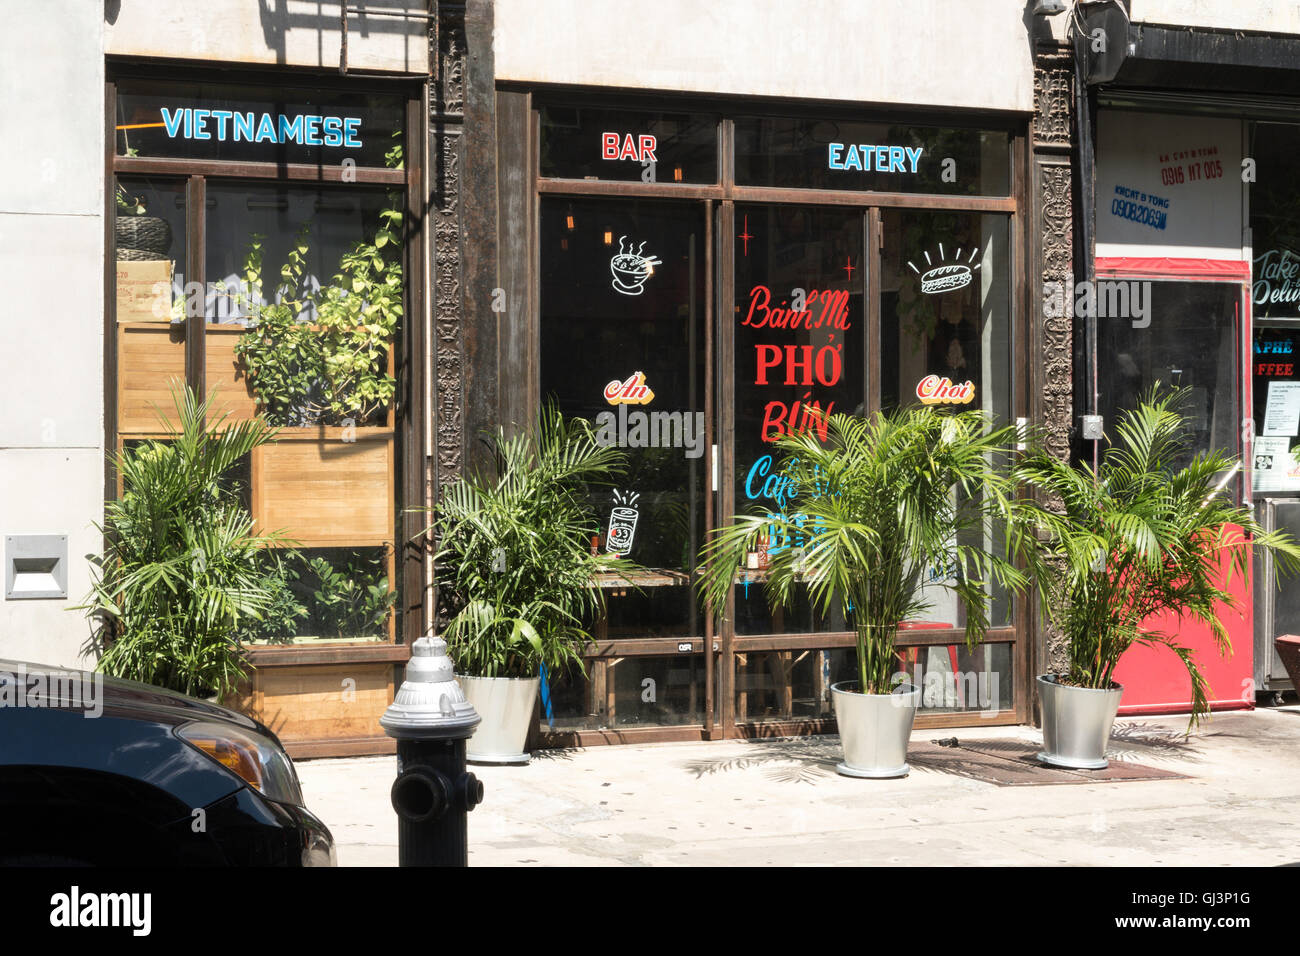 Vietnamese Restaurant Facade Orchard Street Nyc Usa Stock